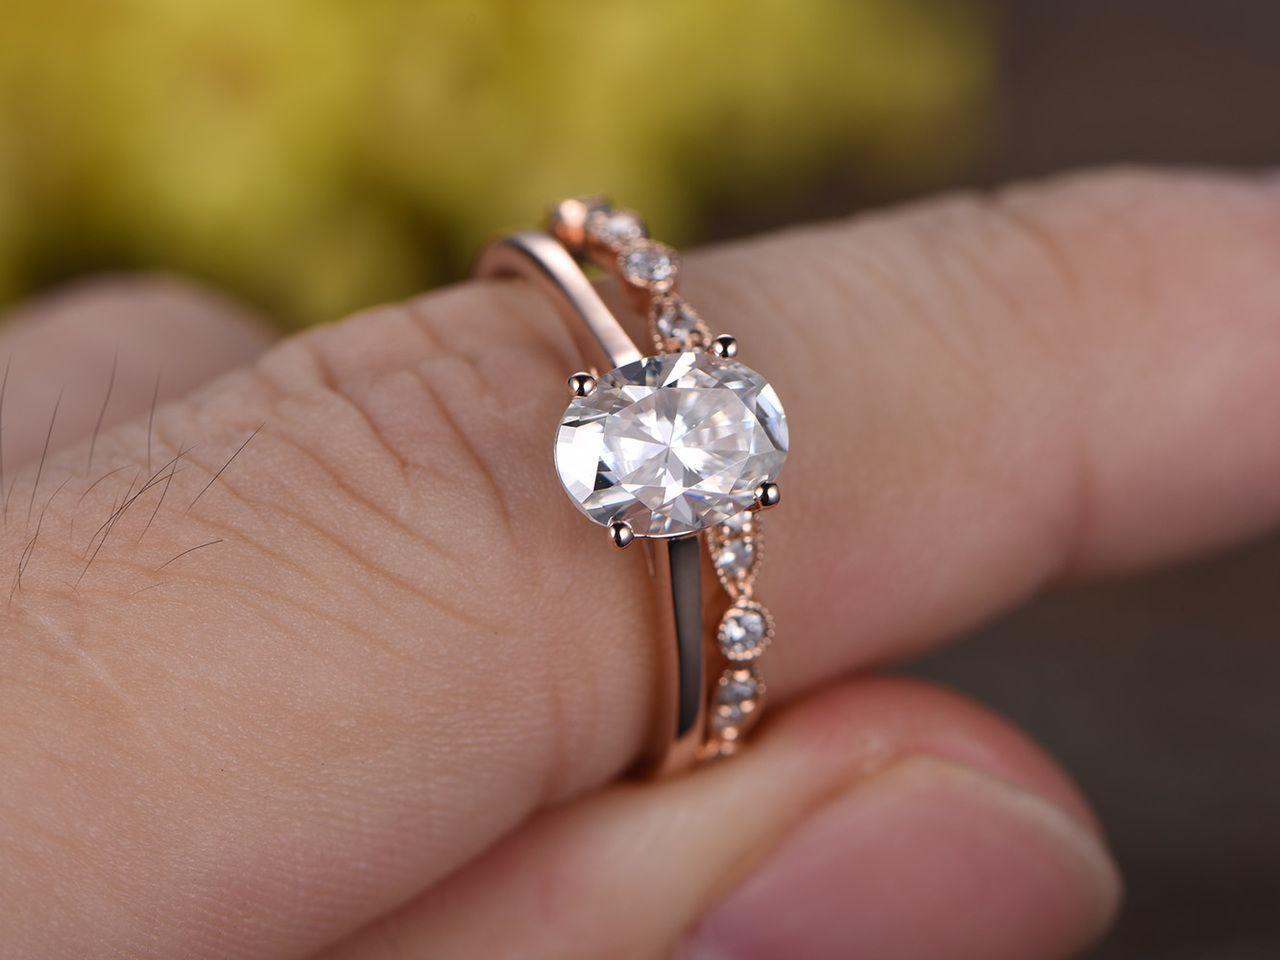 1 5 Carat Moissanite Solitaire Engagement Ring Set Diamond Wedding Band 14k White Gold Art Deco Milgrain Matching Band Moissanite Engagement Ring Solitaire Diamond Wedding Sets Rose Gold Solitaire Ring